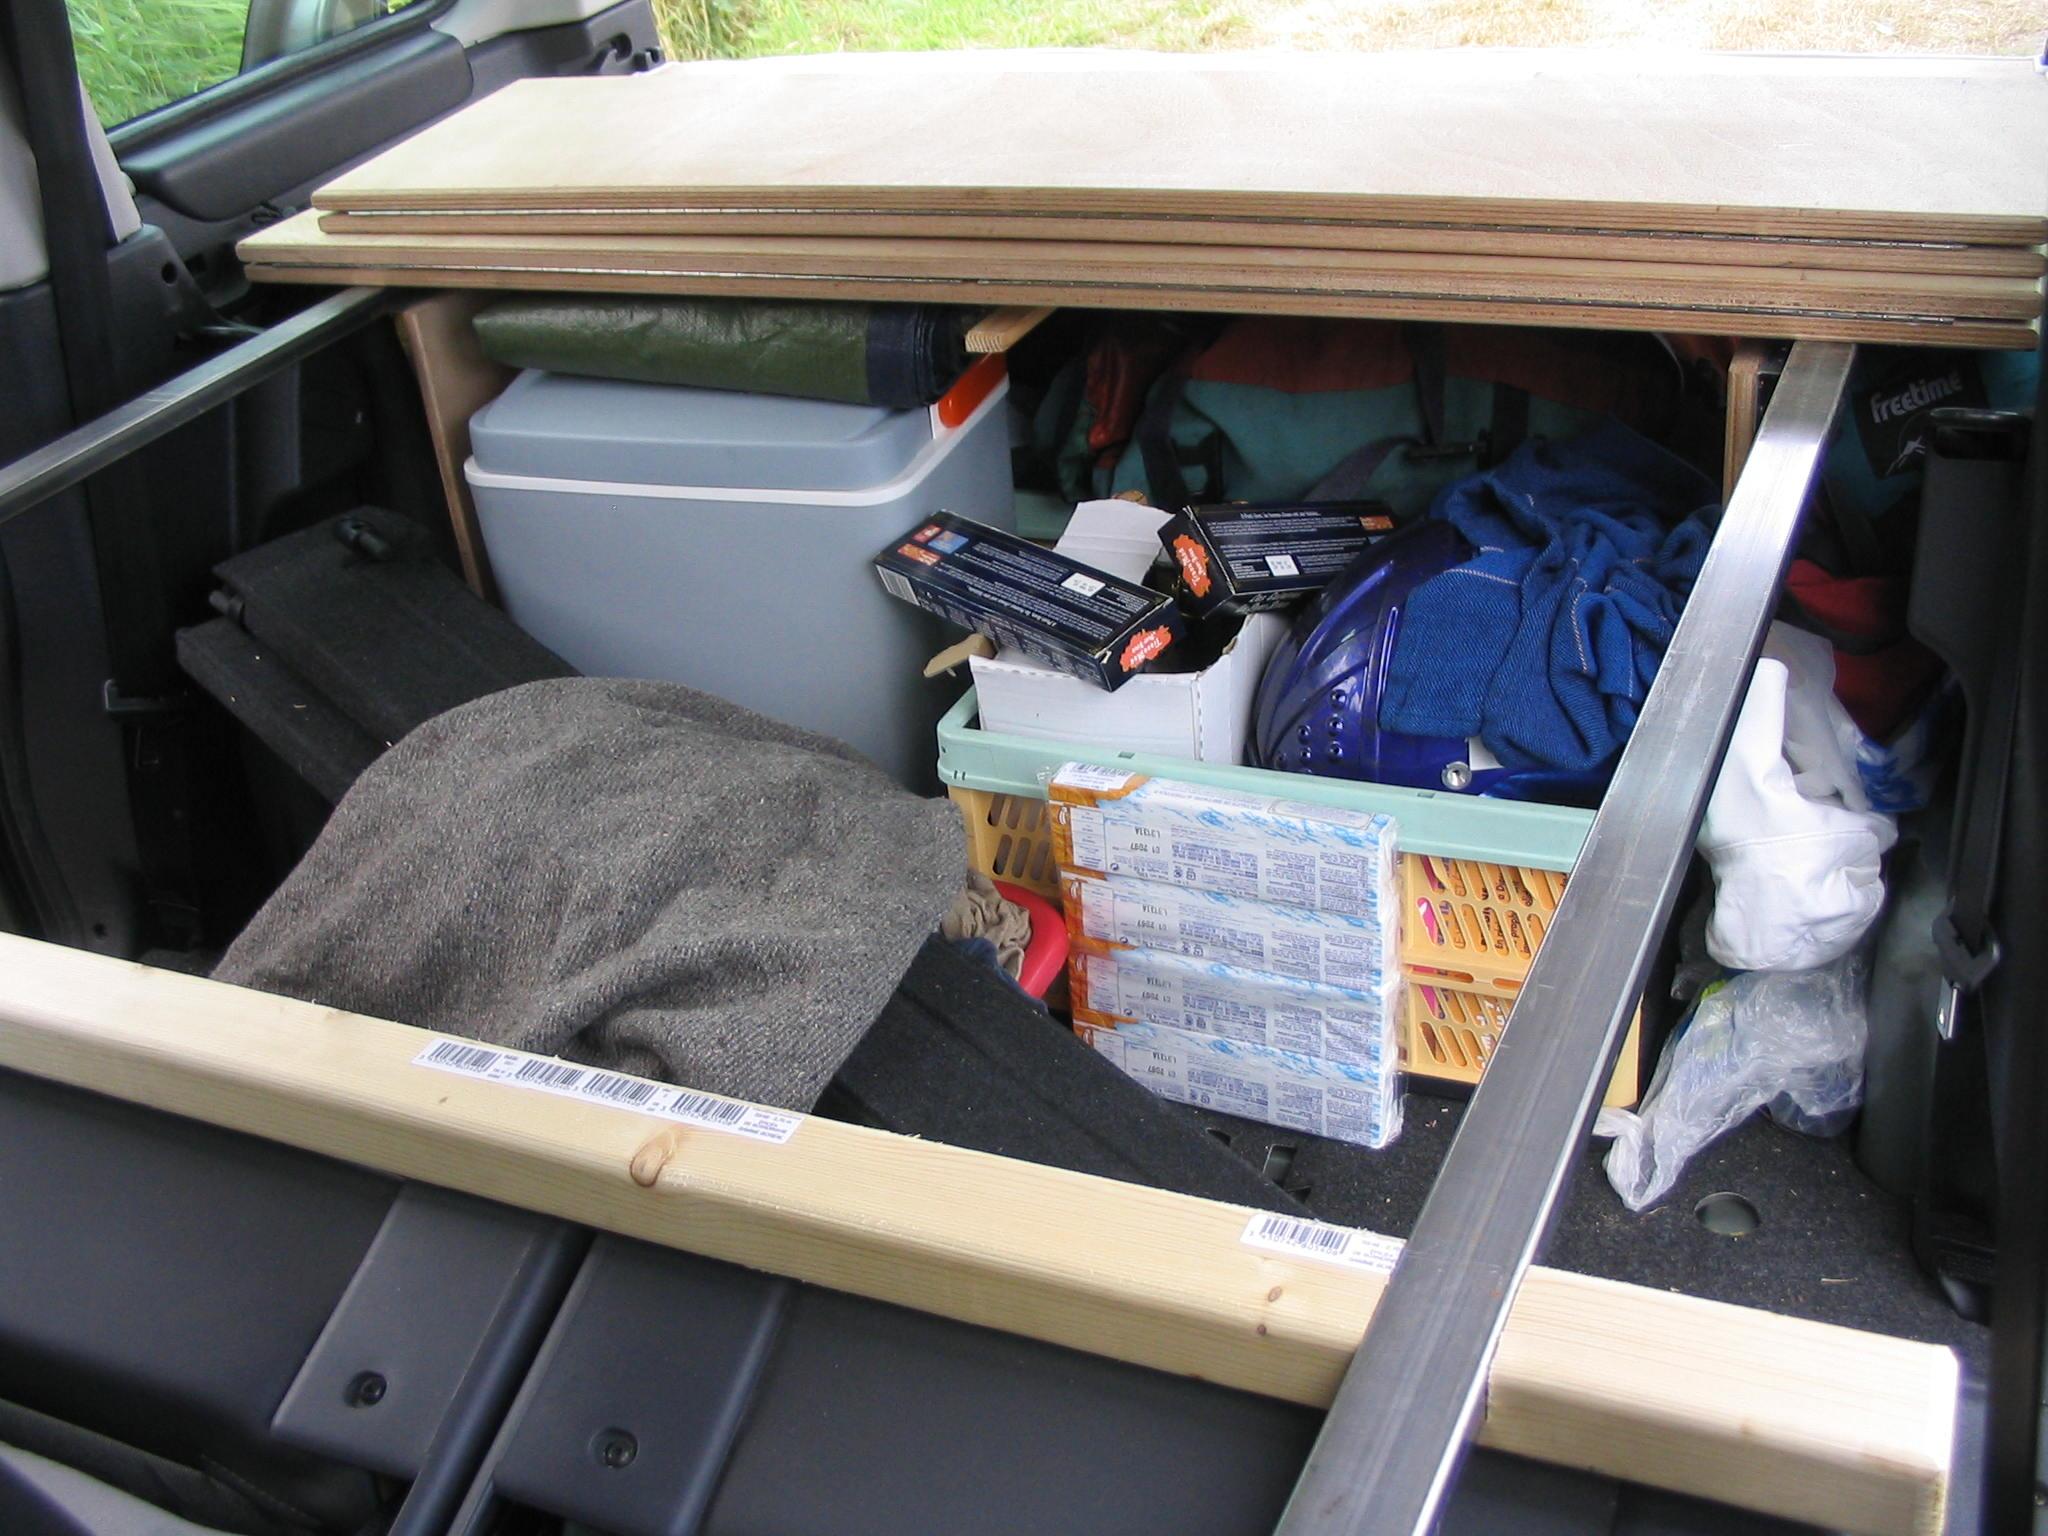 amenager voiture pour dormir ks86 jornalagora. Black Bedroom Furniture Sets. Home Design Ideas